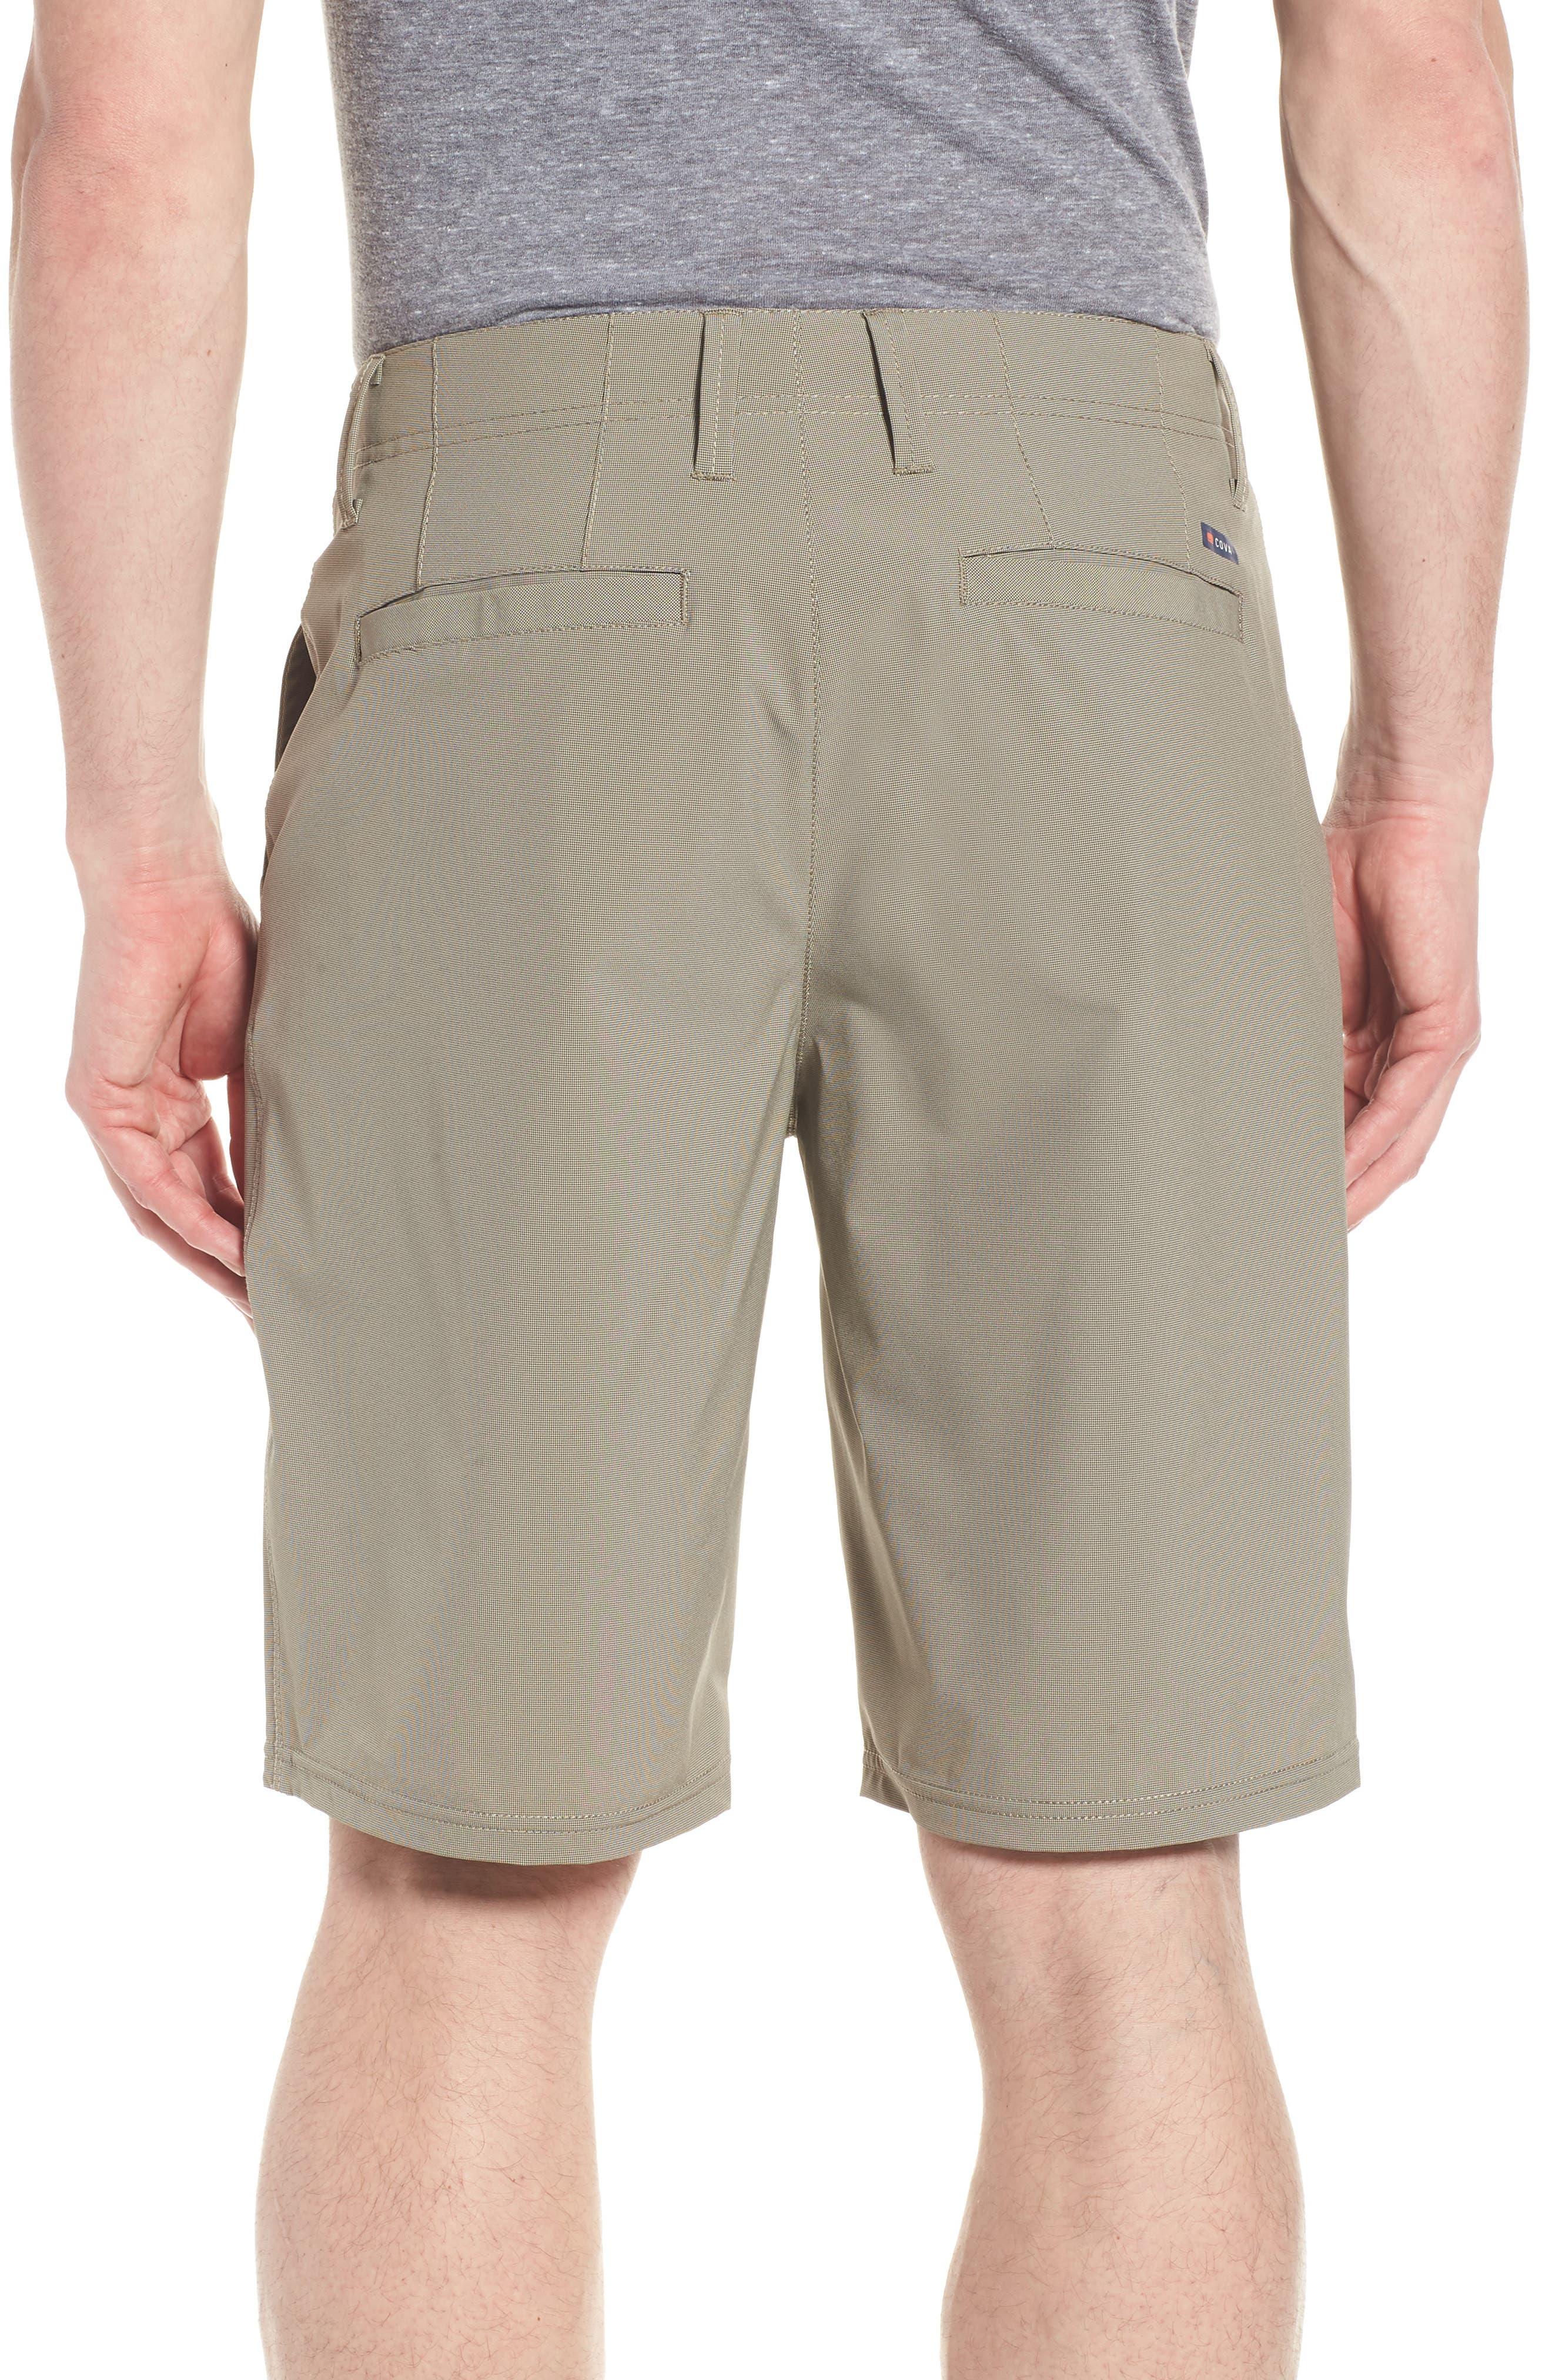 Seaside Hybrid Shorts,                             Alternate thumbnail 2, color,                             ESPRESSO